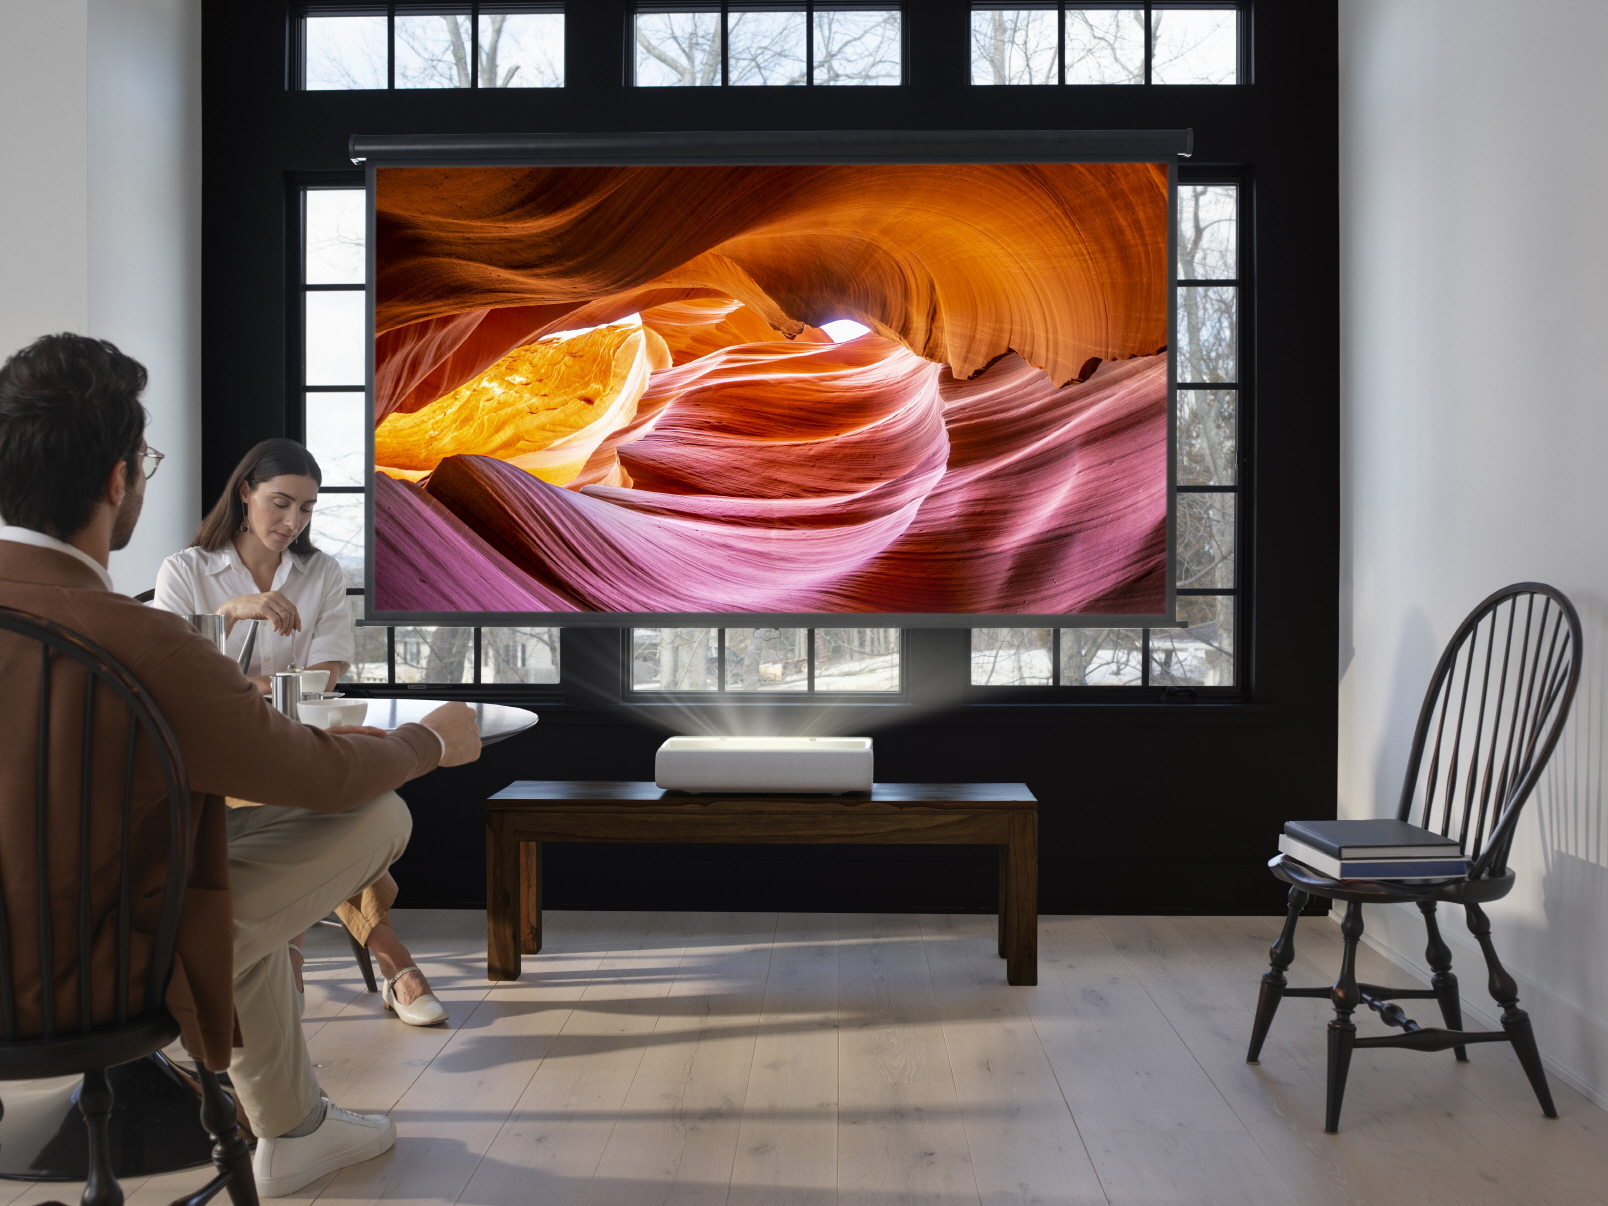 Debiut projektora Samsung The Premiere o ultrakrótkim rzucie